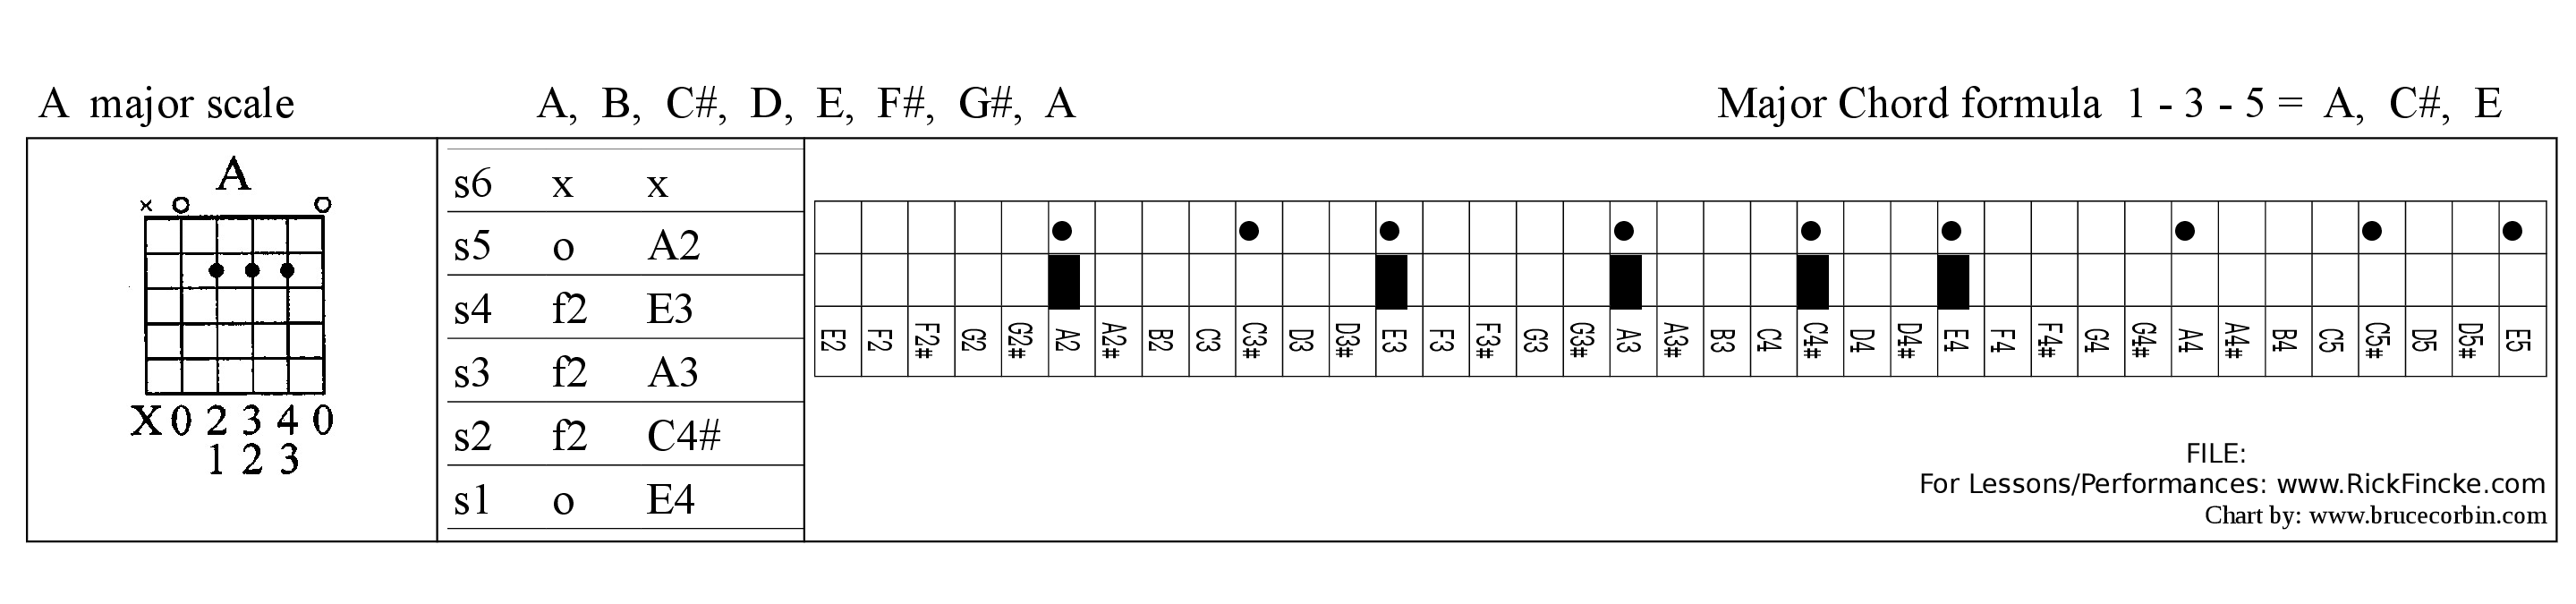 Guitar Chords Bruce Corbin